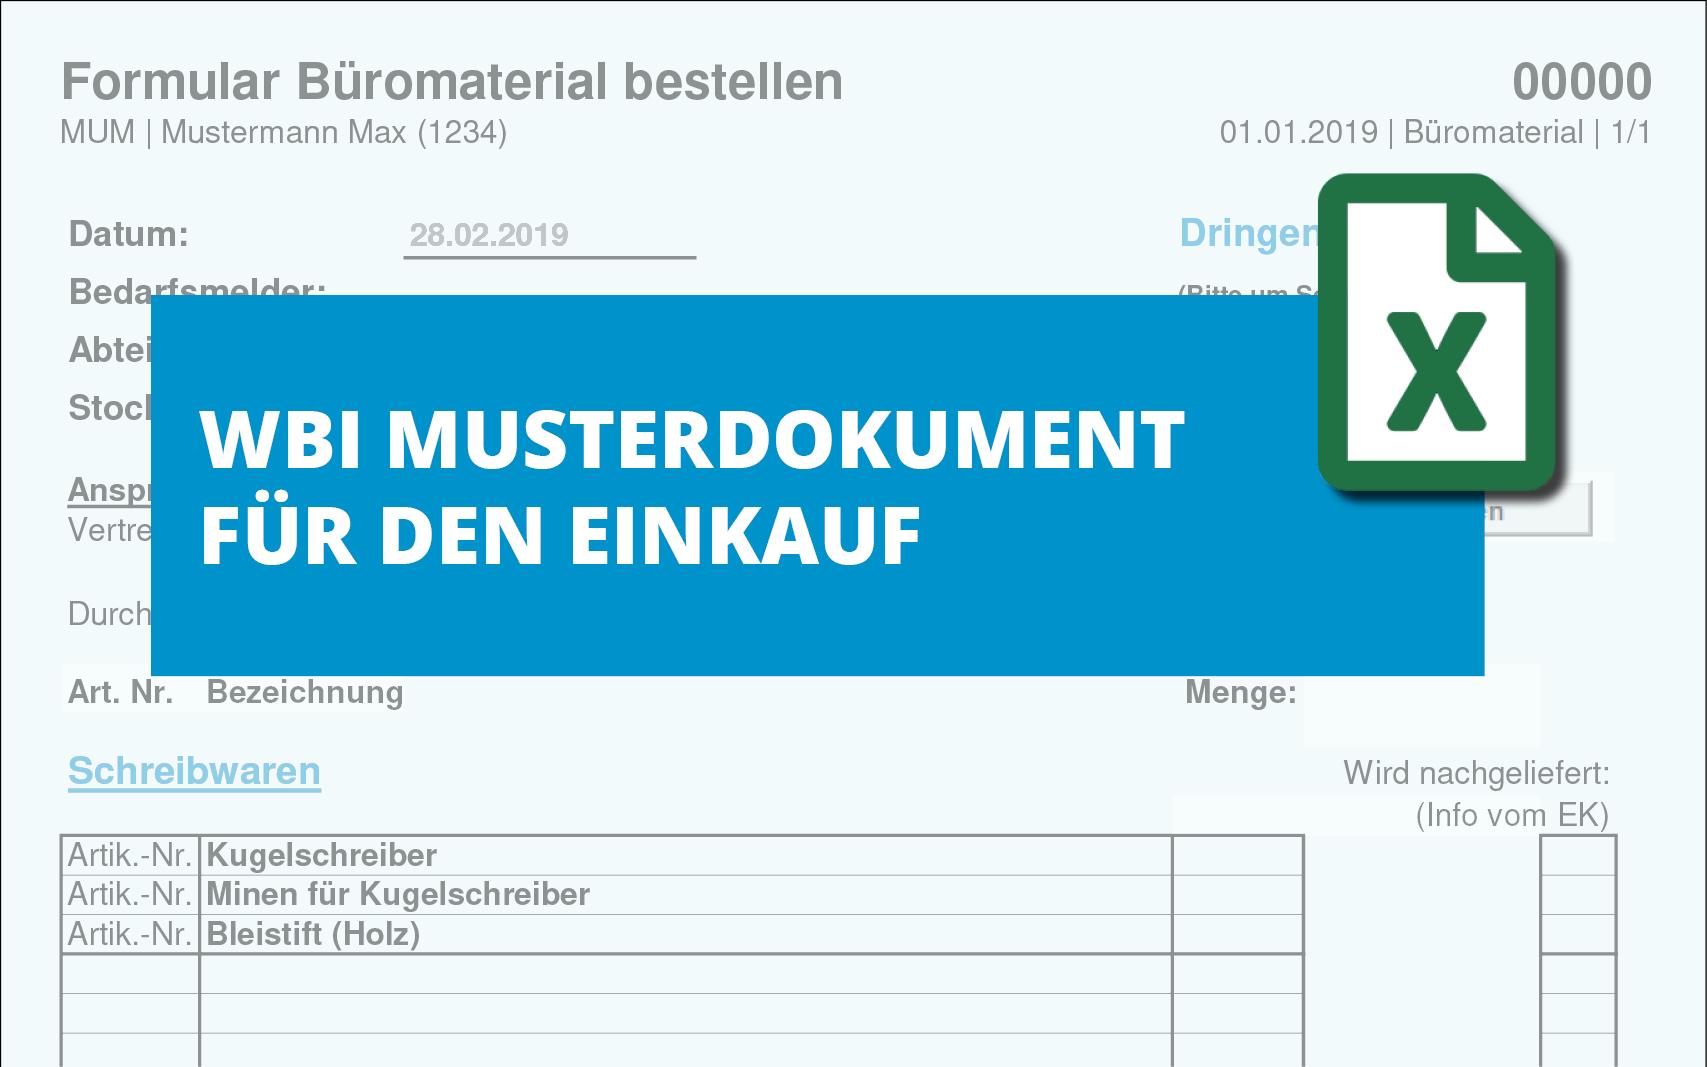 formular-bueromaterial-bestellen